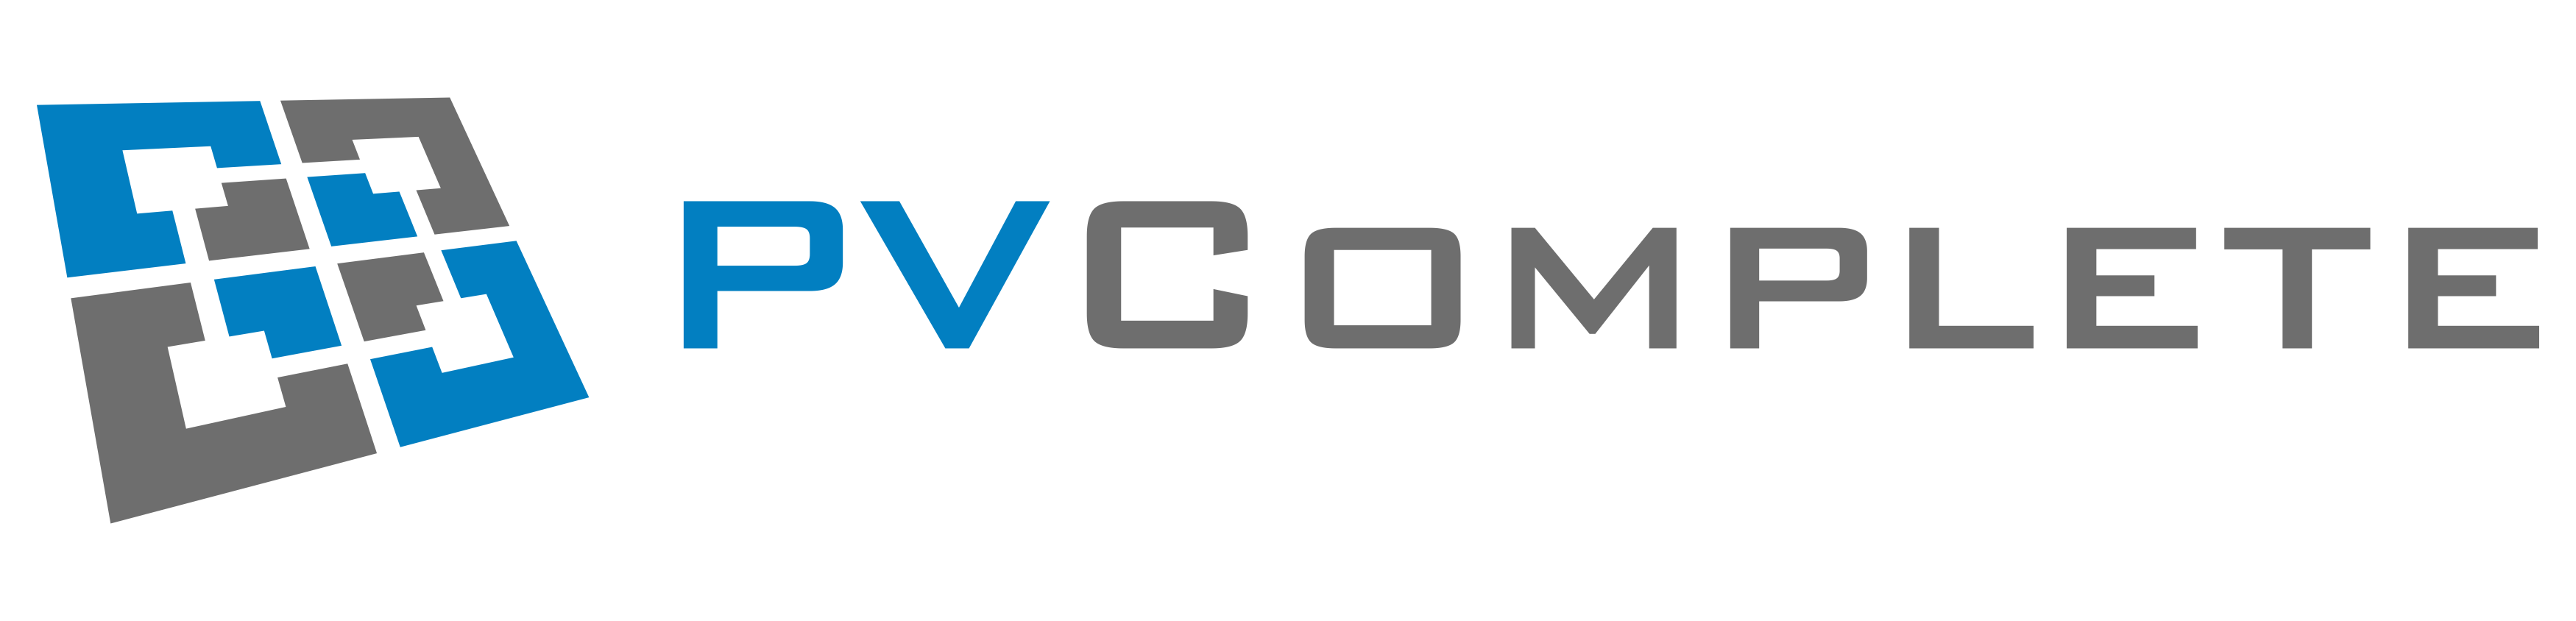 PVComplete logo